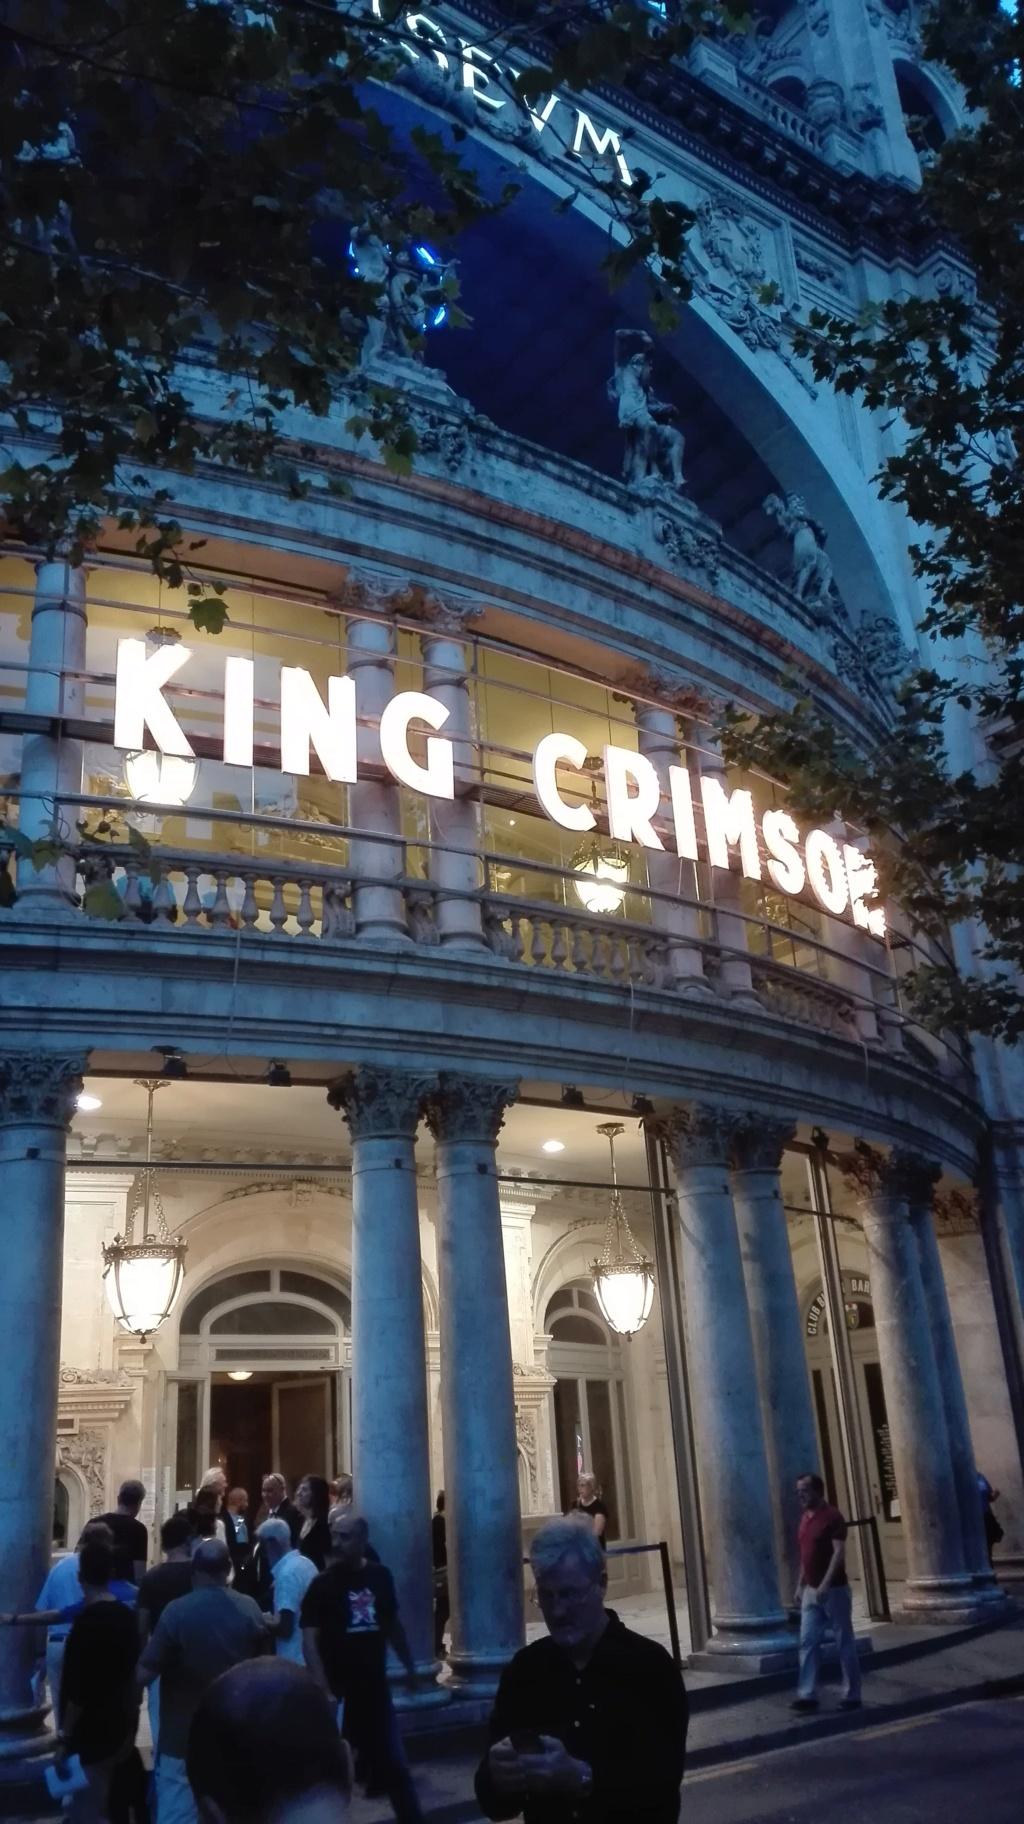 King Crimson - Página 10 Img_2061